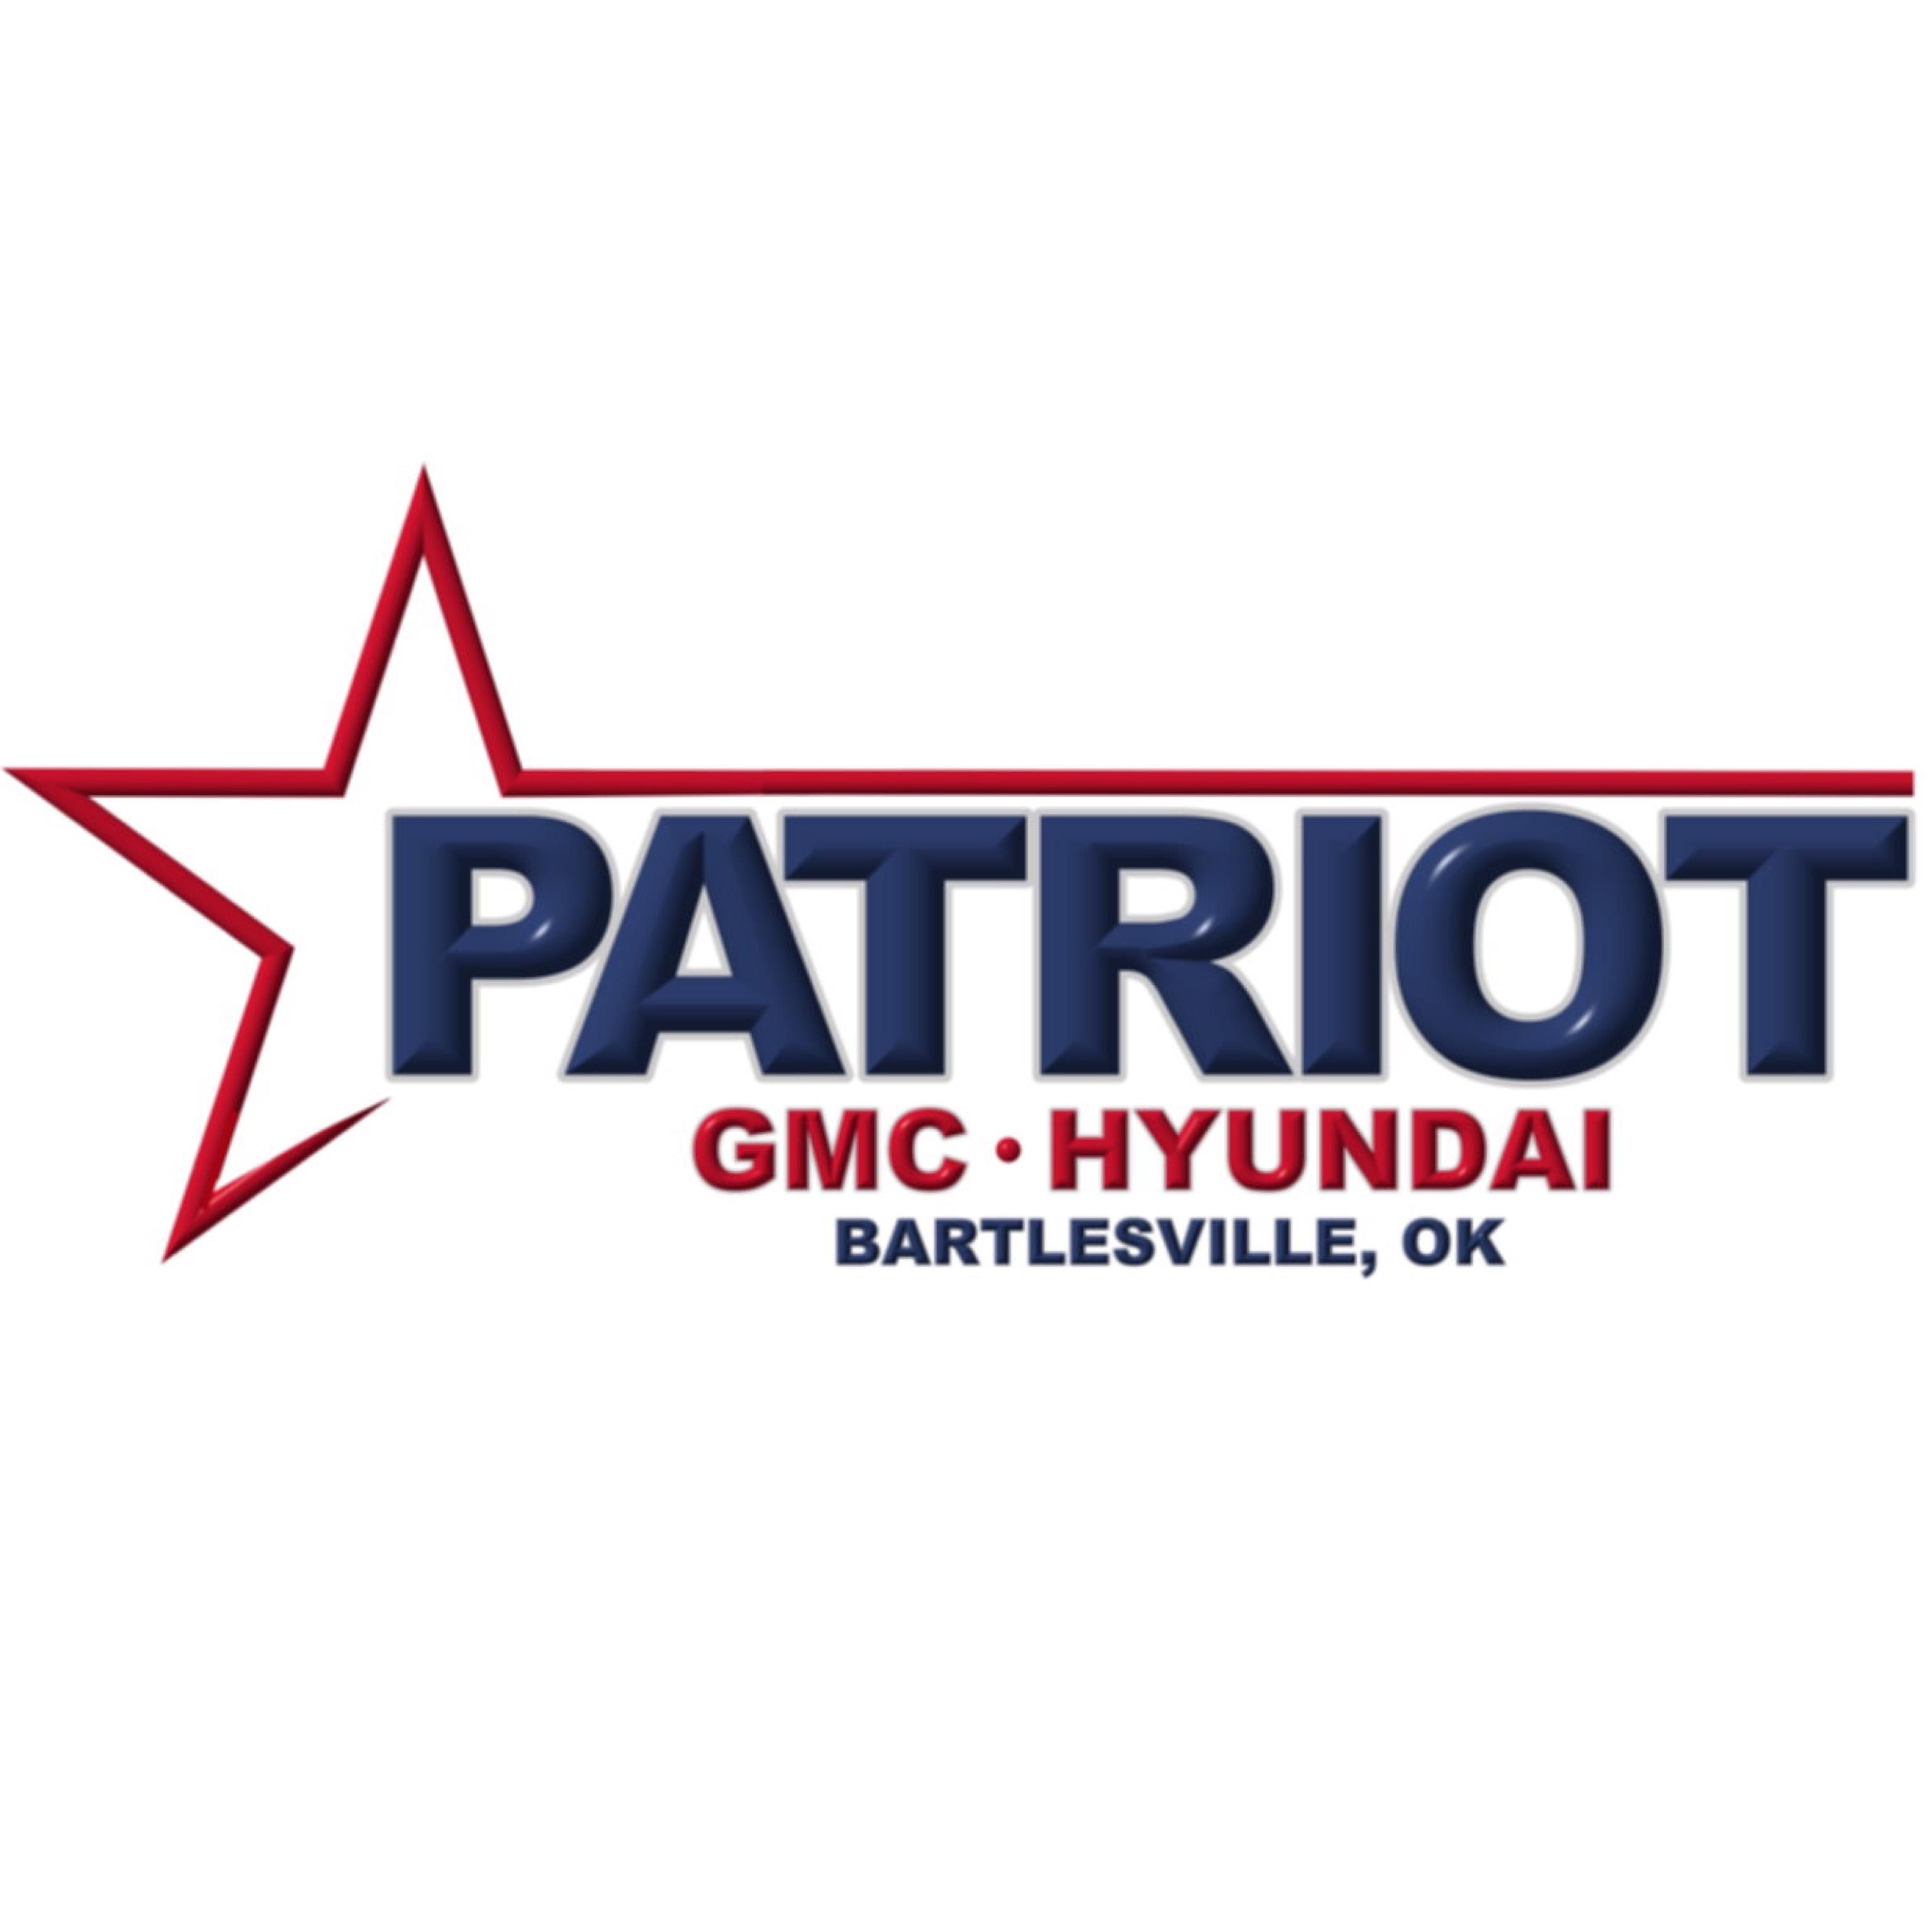 Patriot Gmc Bartlesville >> Patriot Gmc Hyundai Patriotbville Twitter